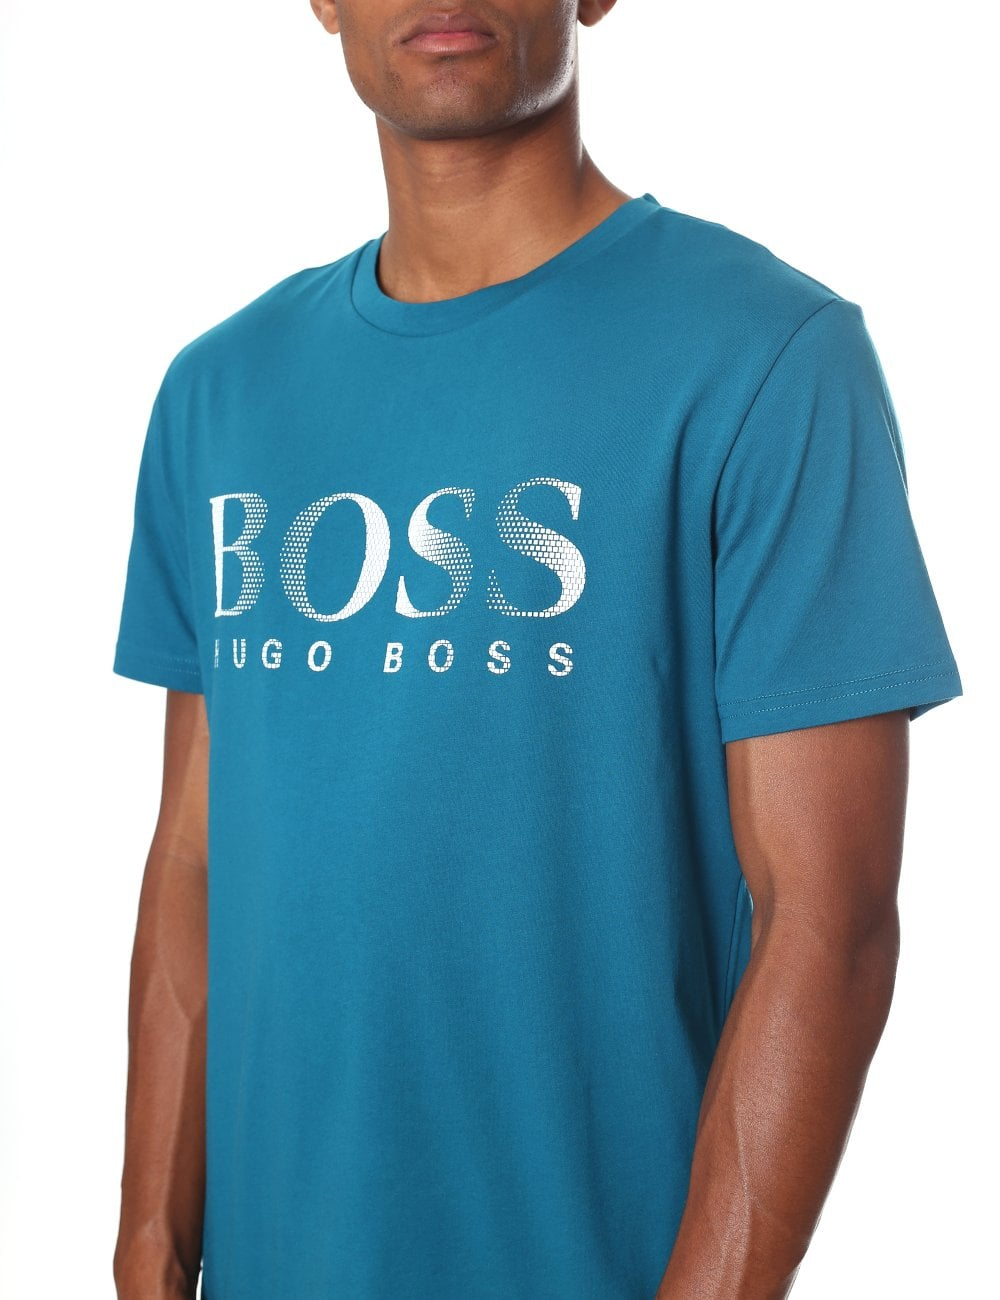 5c3ec4cbddf8 Boss Black Men's Slim Fit Crew Neck Short Sleeve Tee